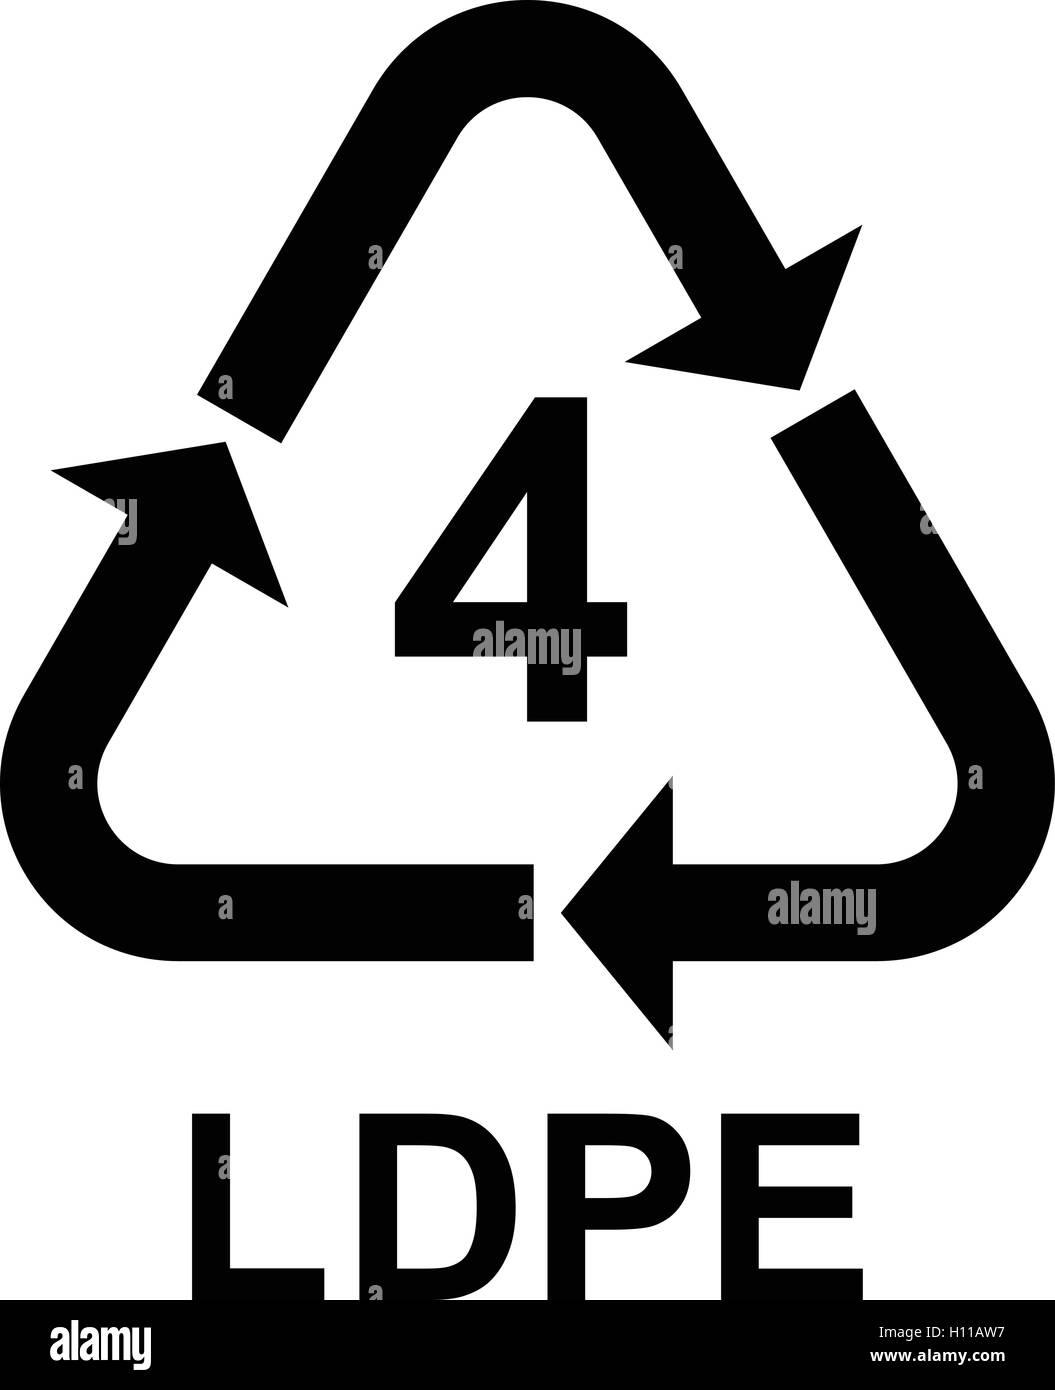 Plastic recycling symbol ldpe 4 plastic recycling code ldpe 4 stock plastic recycling symbol ldpe 4 plastic recycling code ldpe 4 vector illustration biocorpaavc Choice Image